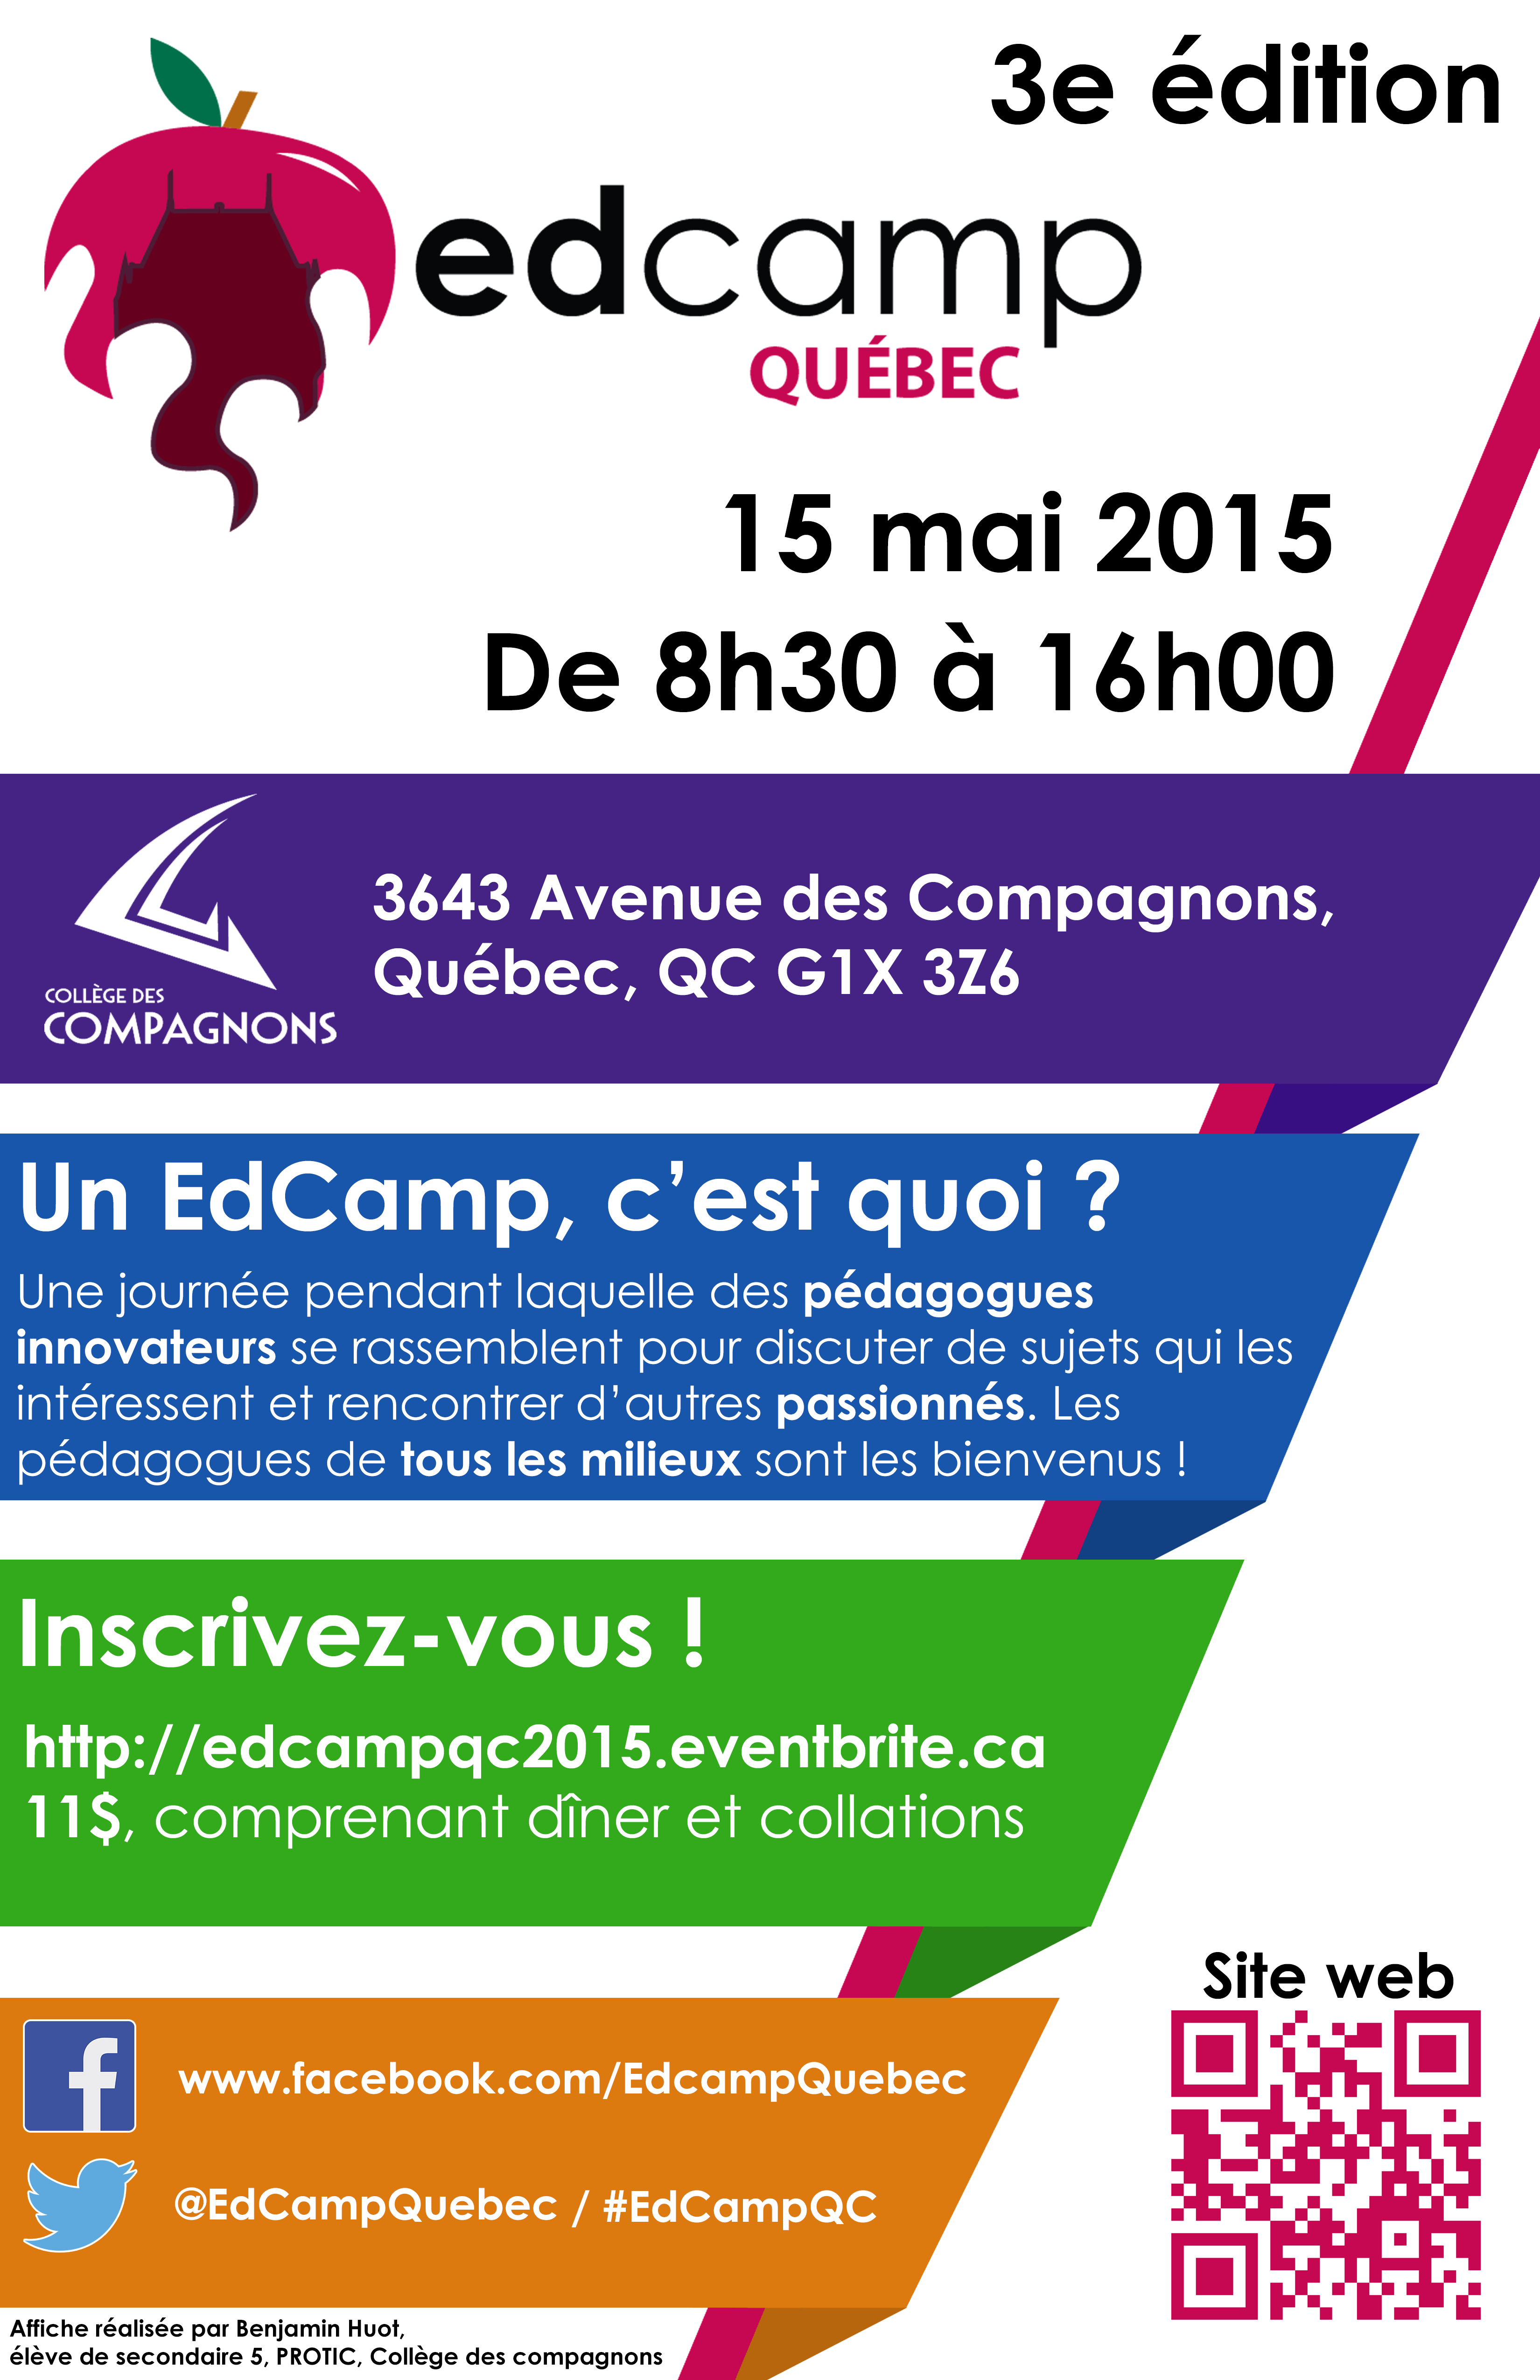 external image affiche_edcamp_2015.png